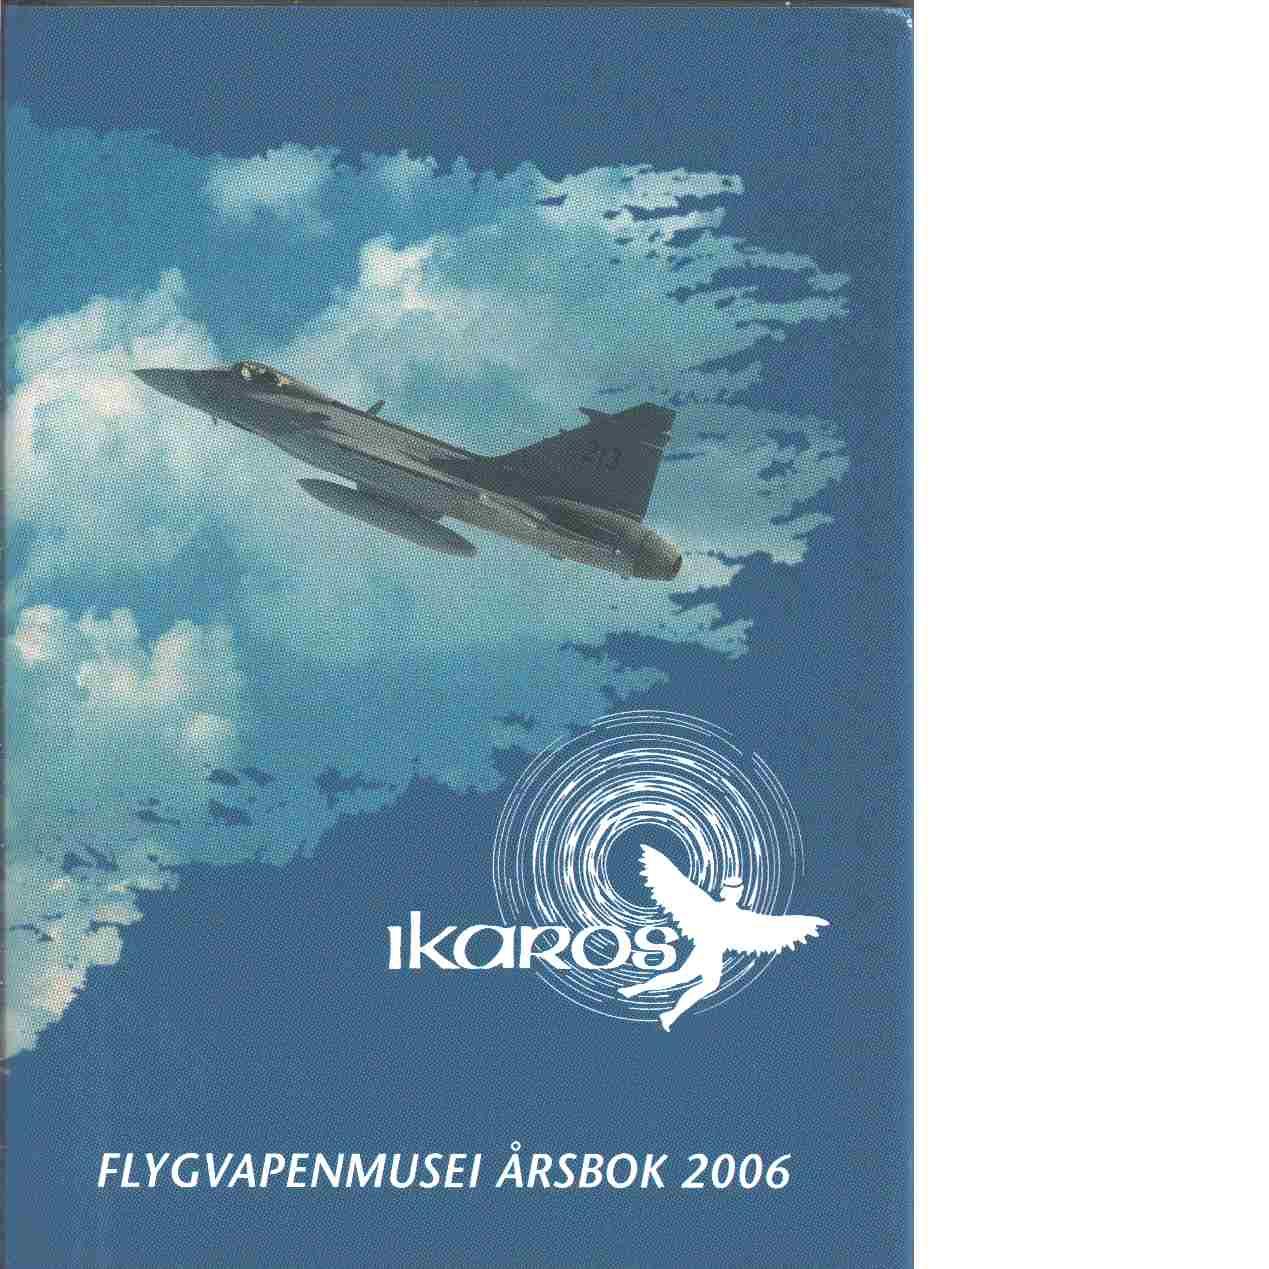 Ikaros : Flygvapenmusei årsbok 2006 - Red. Flygvapenmuseum